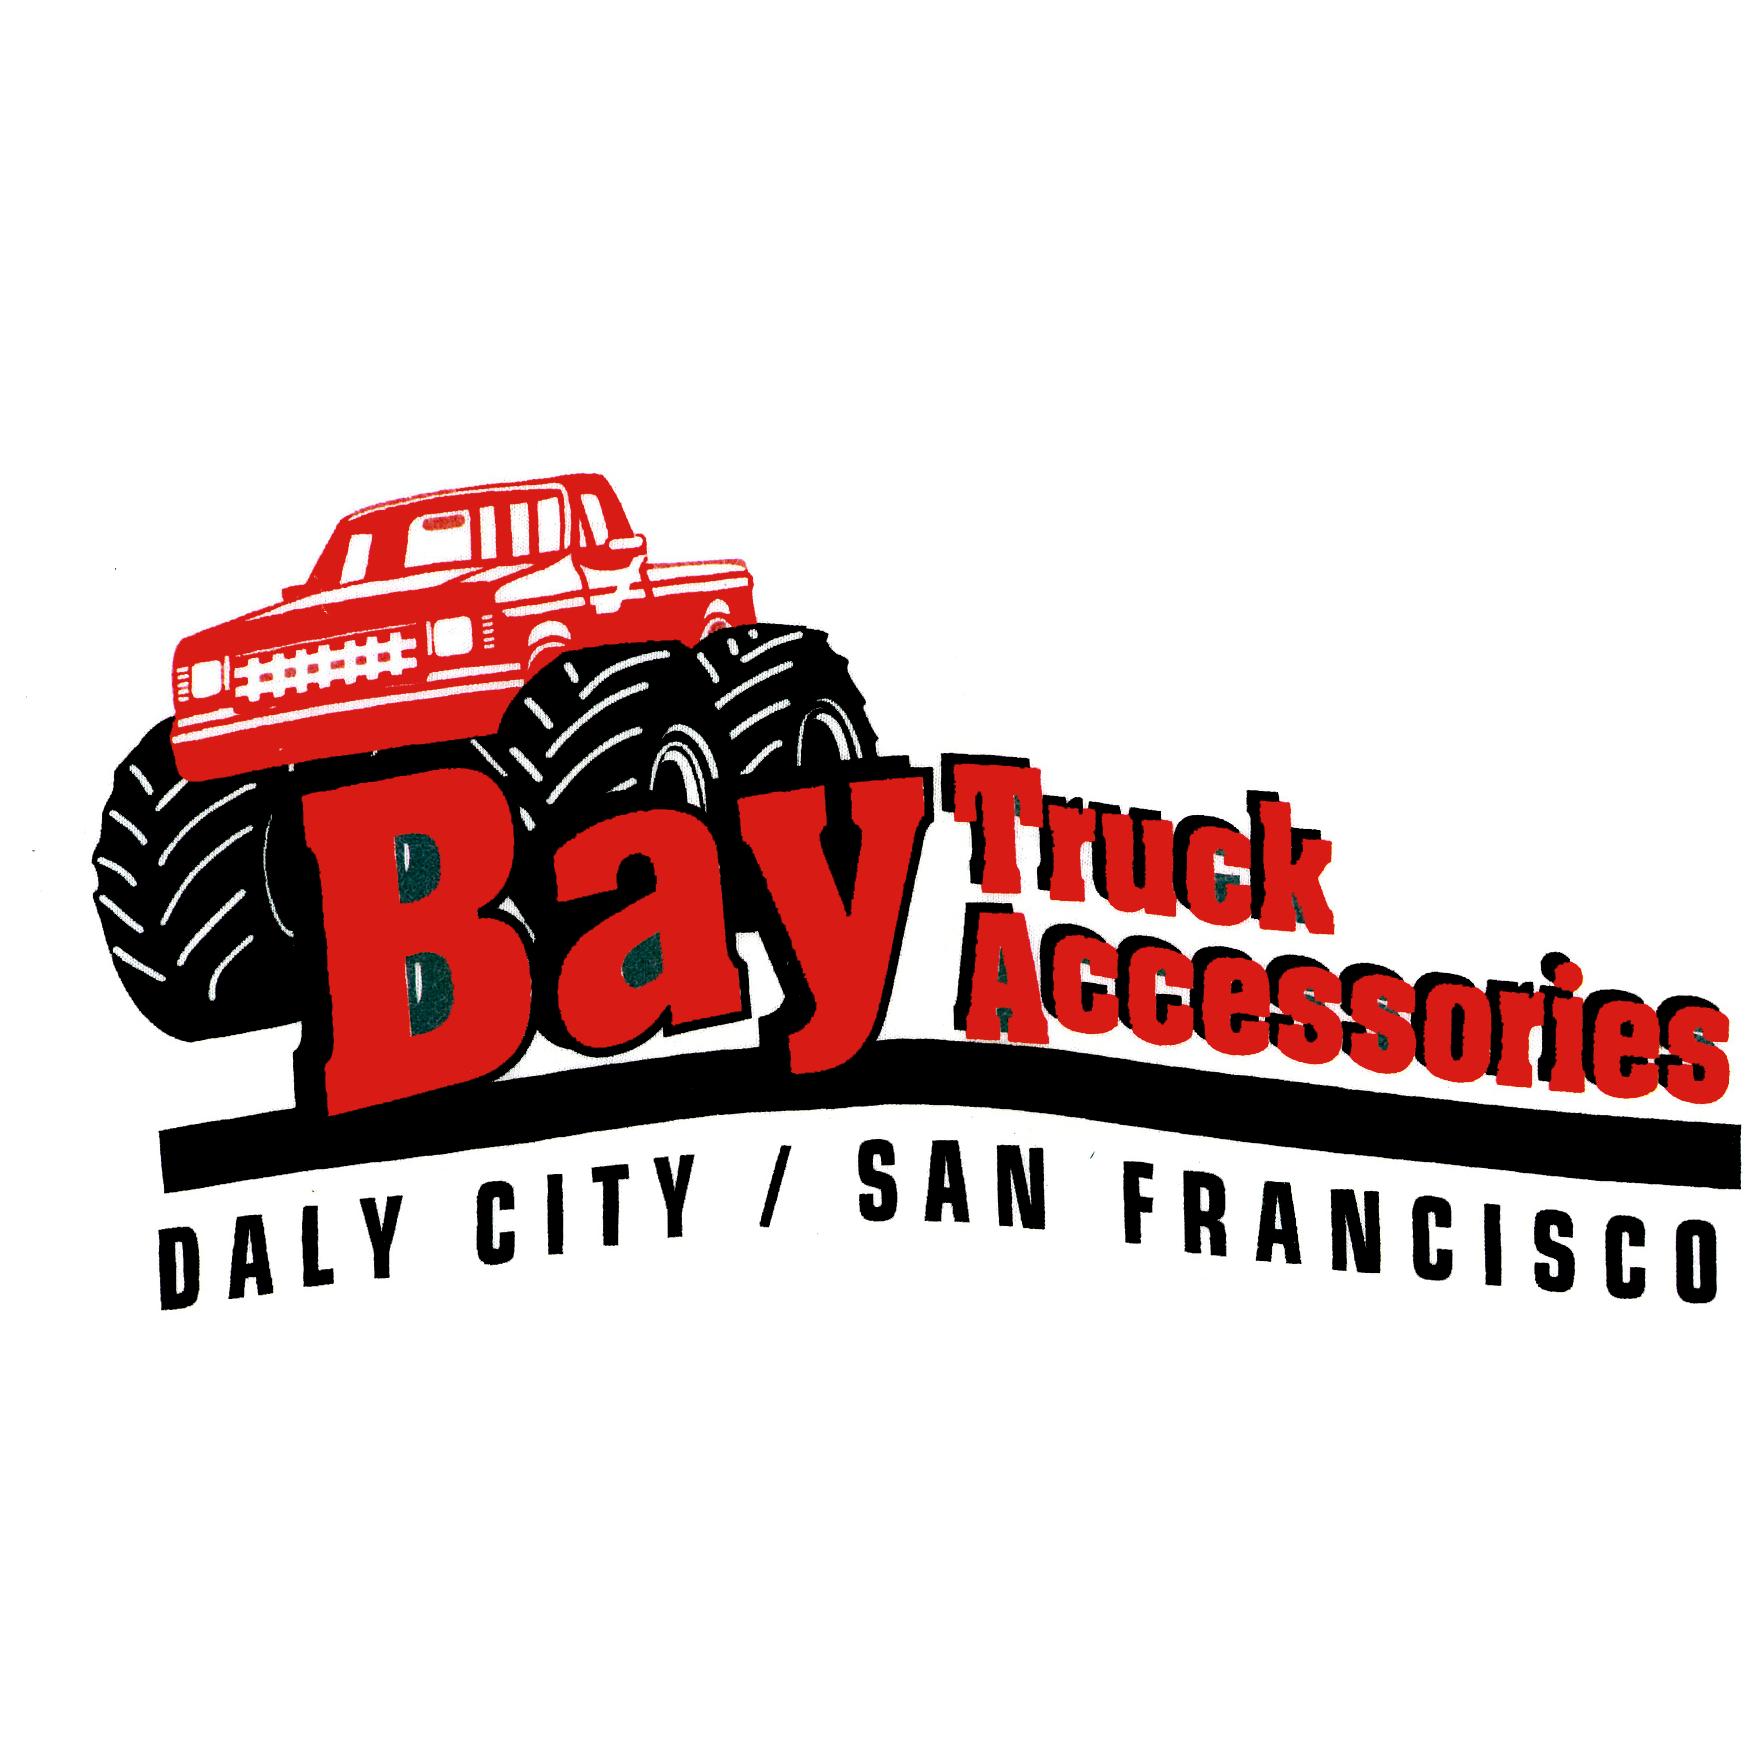 Bay Truck Accessories, Inc